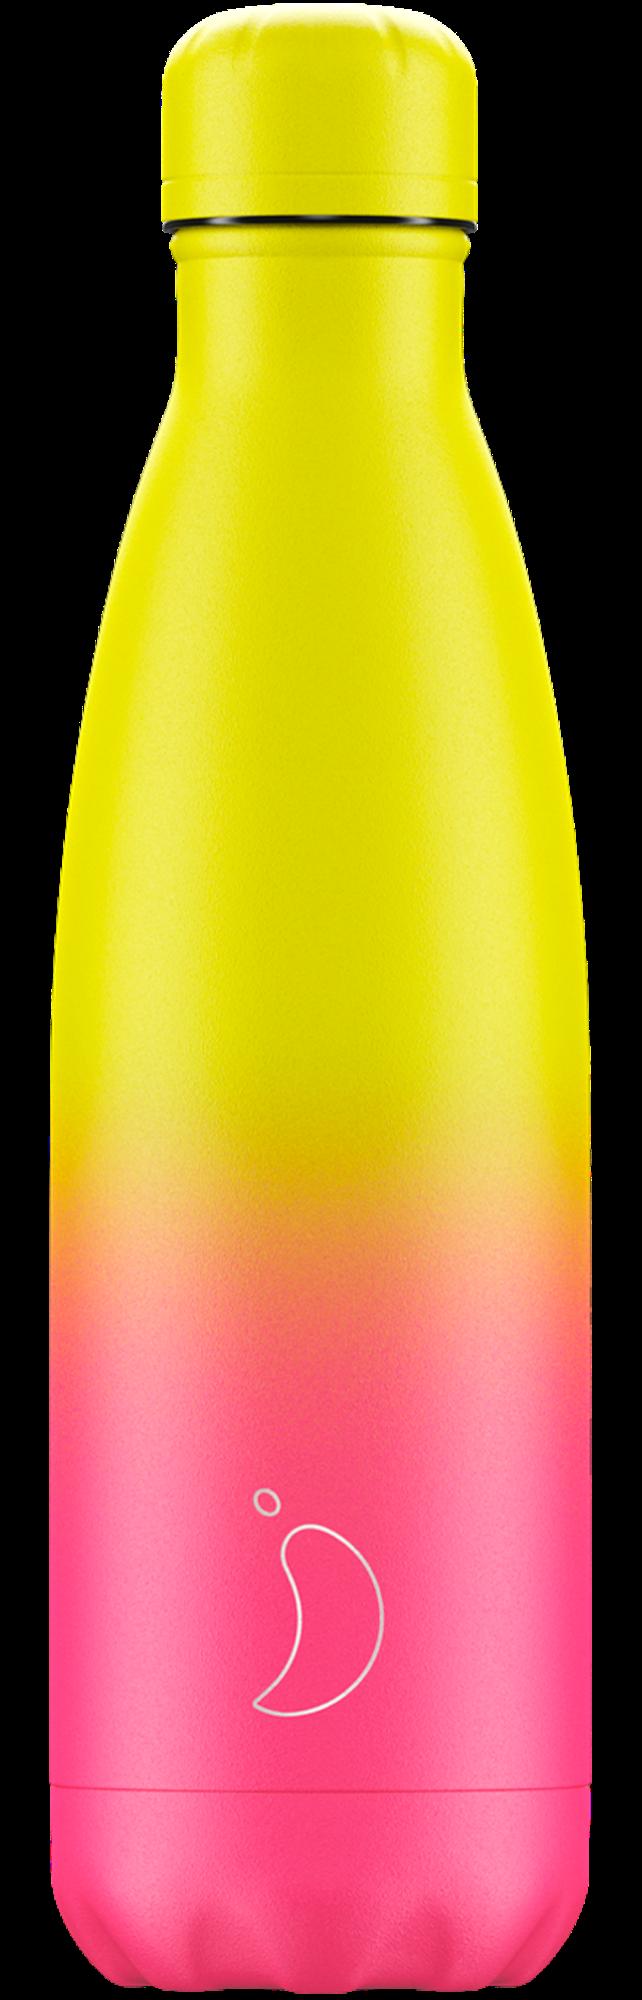 CHILLY'S BOTTLE 500ML - [GRADIENT) NEON